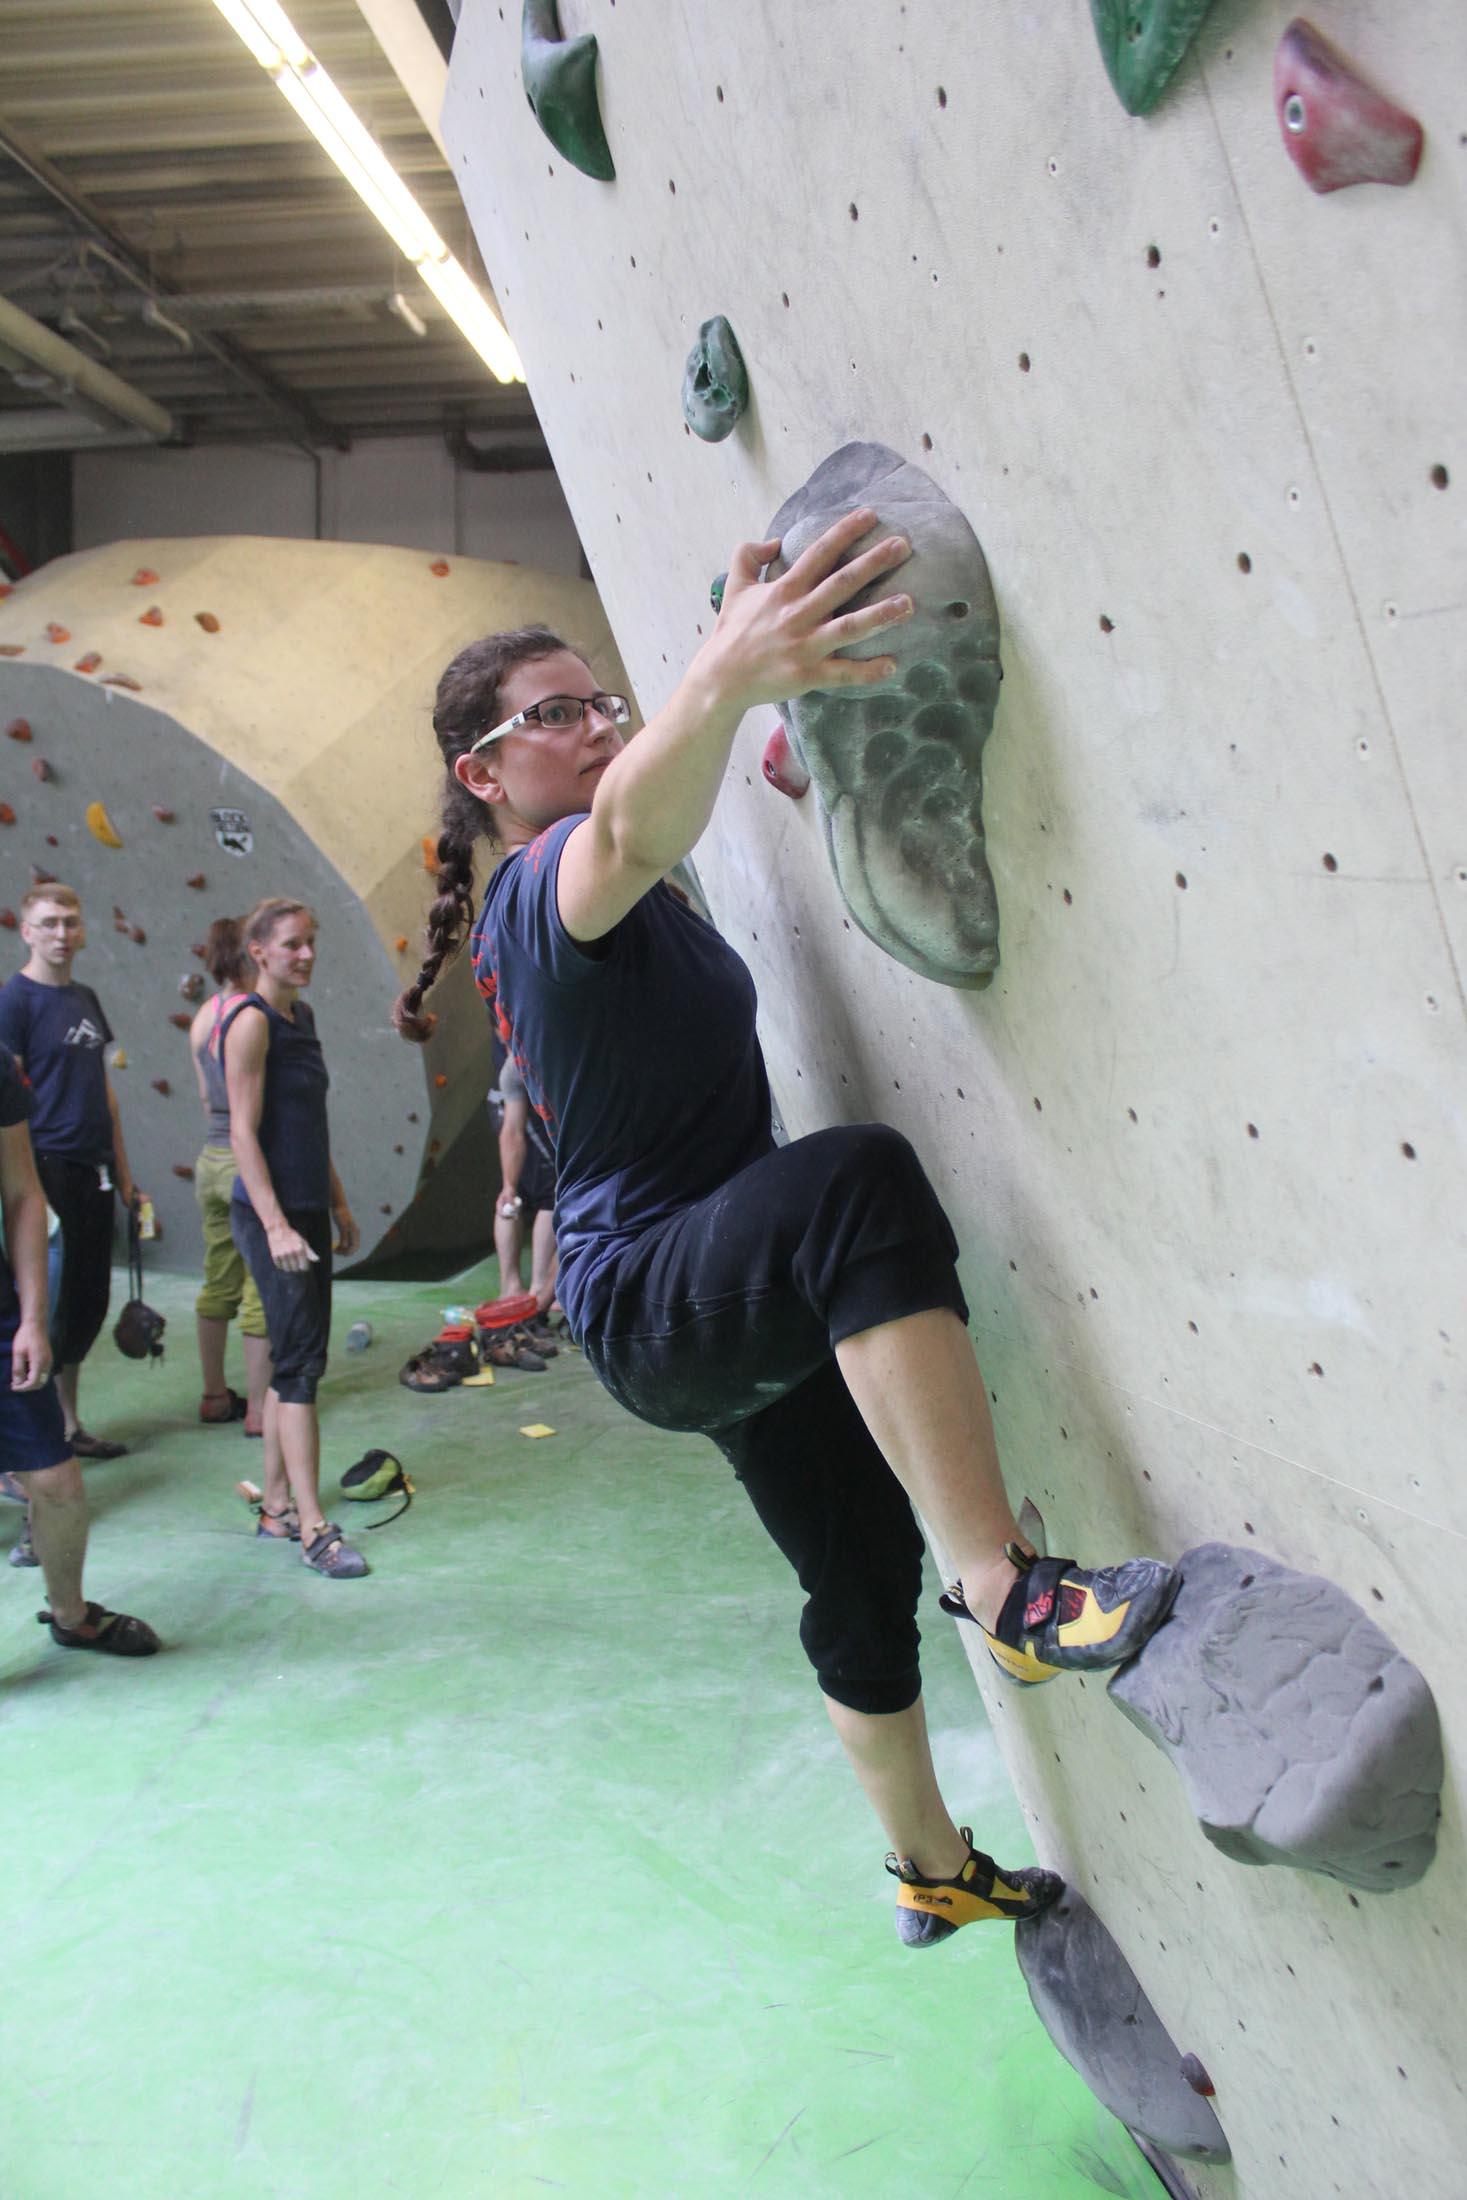 Quali, internationaler bouldercup Frankenjura 2016, BLOCKHELDEN Erlangen, Mammut, Bergfreunde.de, Boulderwettkampf07092016265